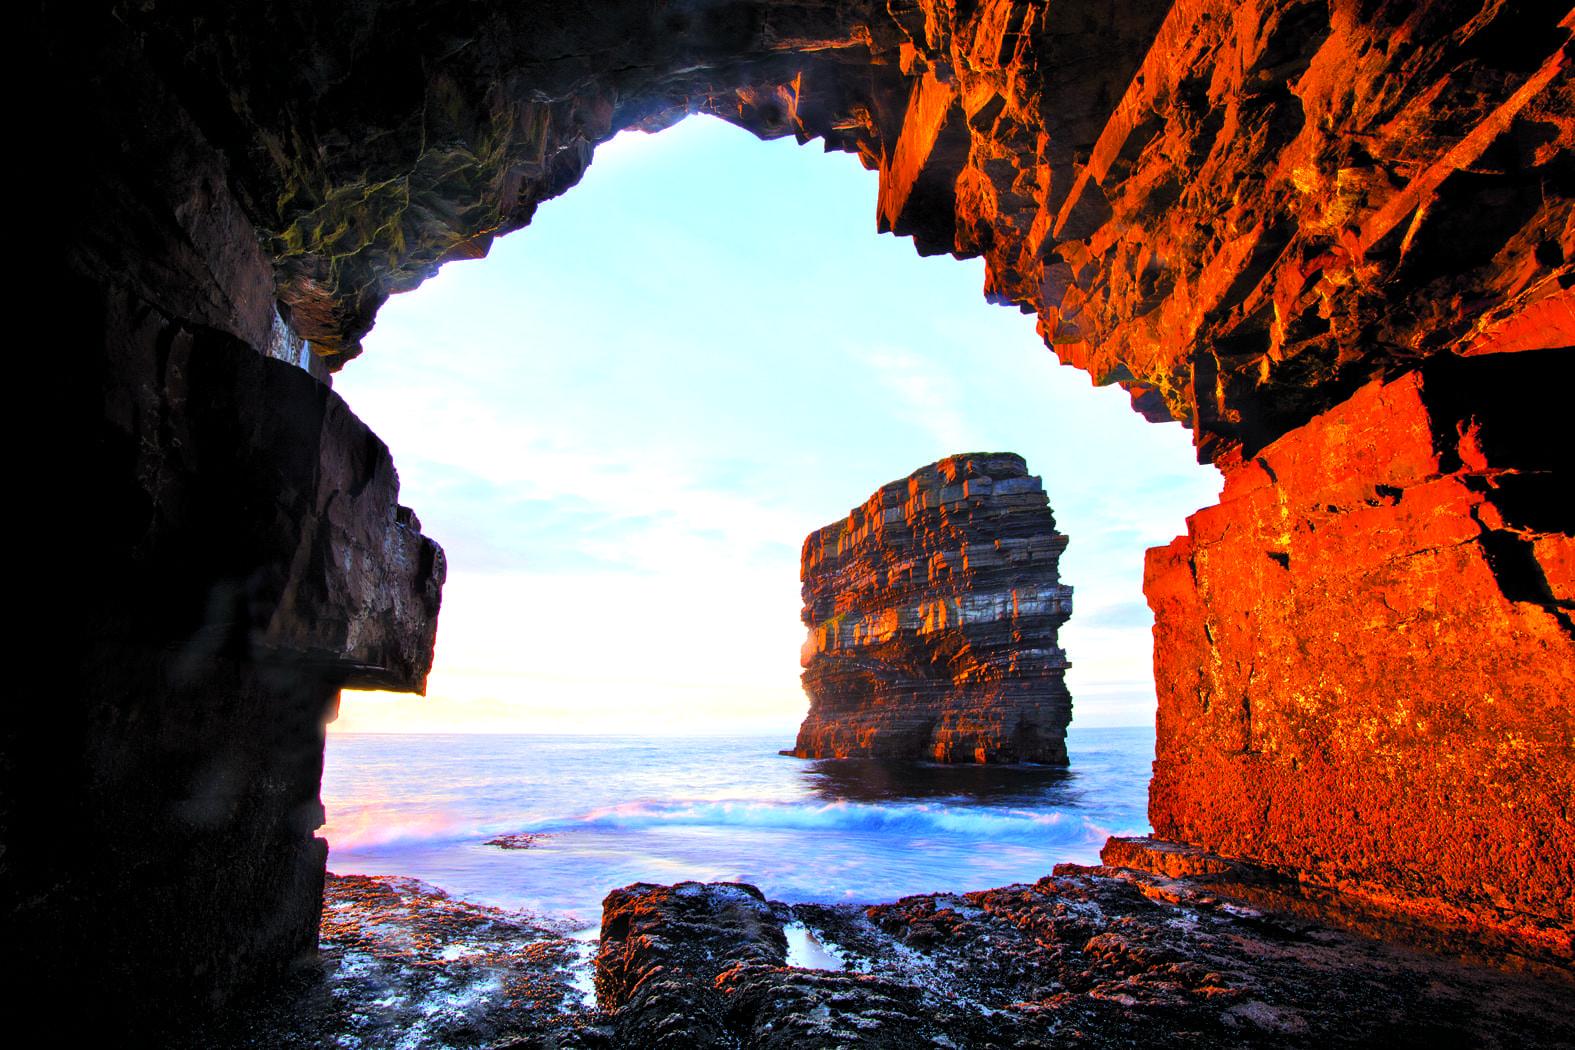 Dun Briste from Downpatrick Head sea cave, Co Mayo, Ireland.